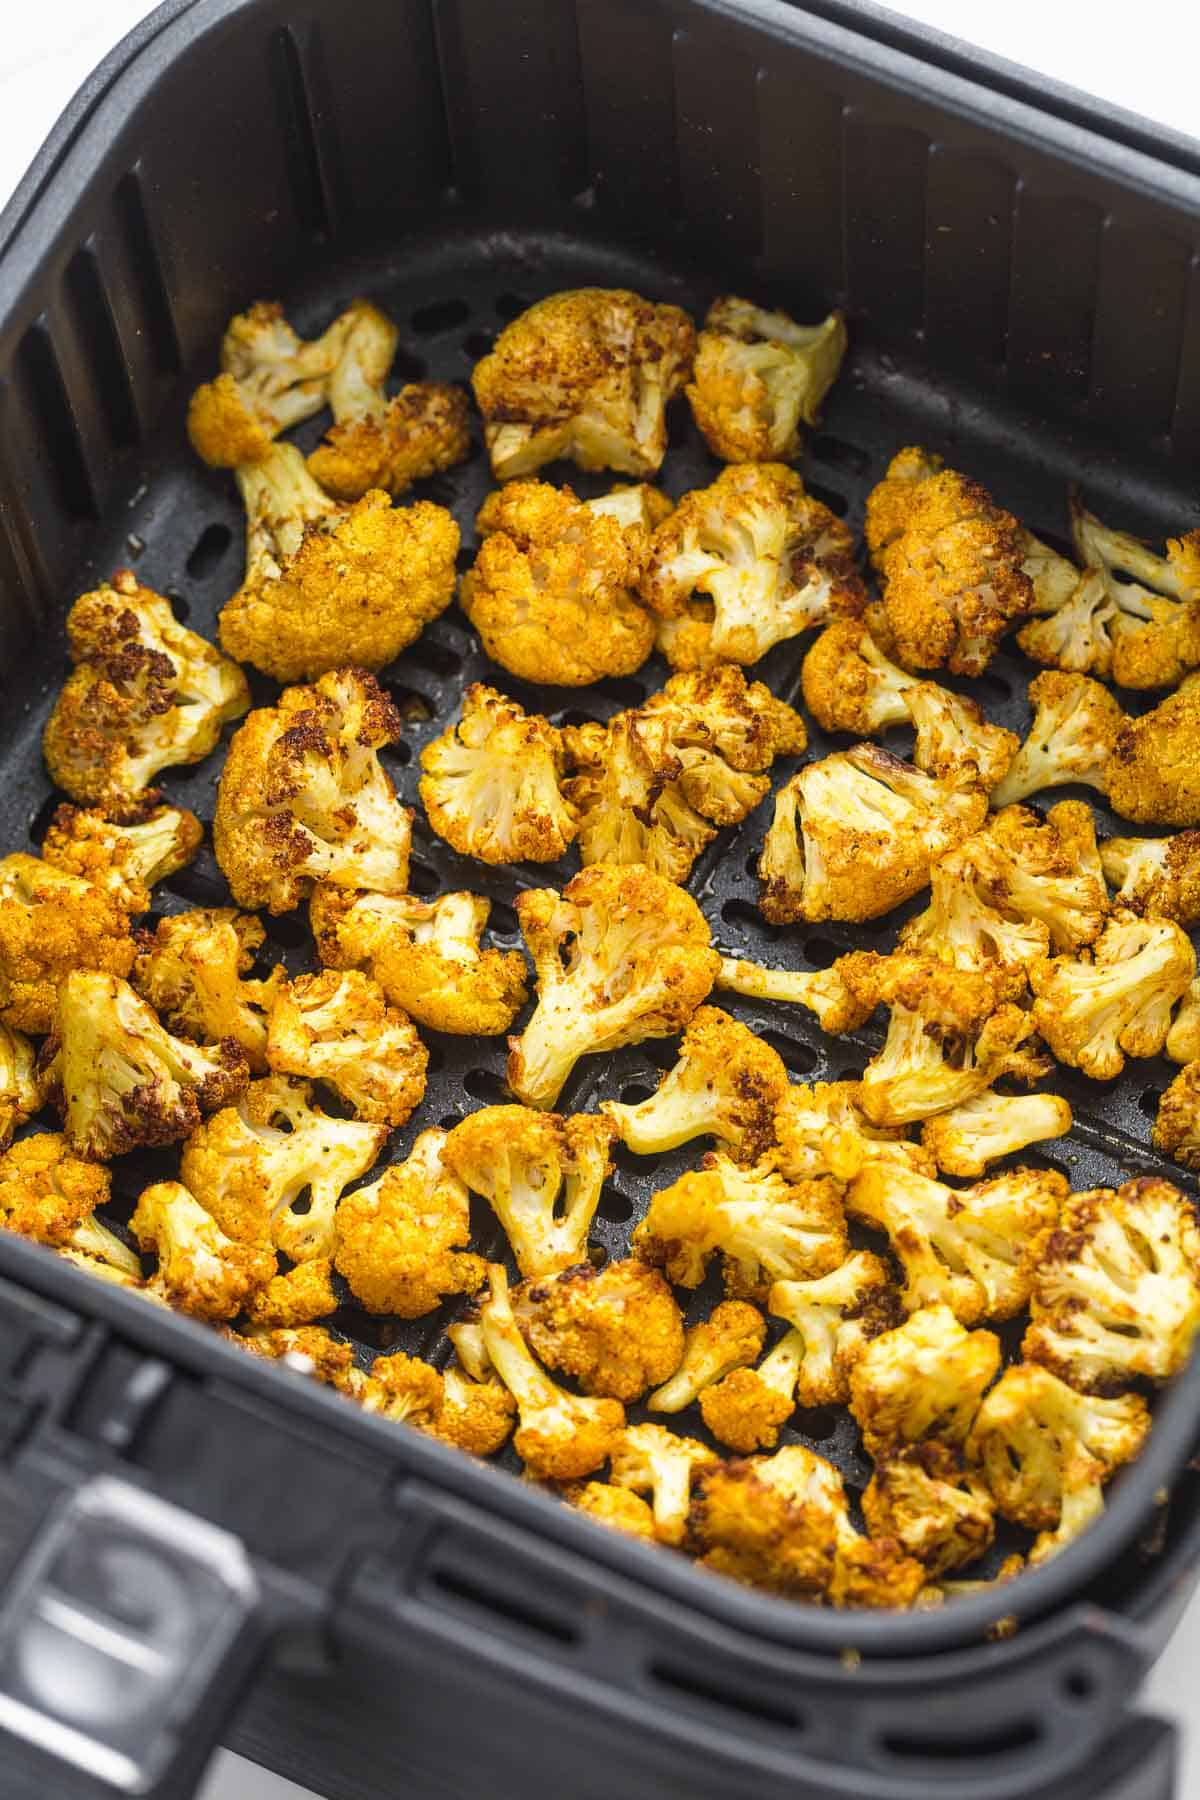 Crispy Air fried cauliflower in an air fryer basket